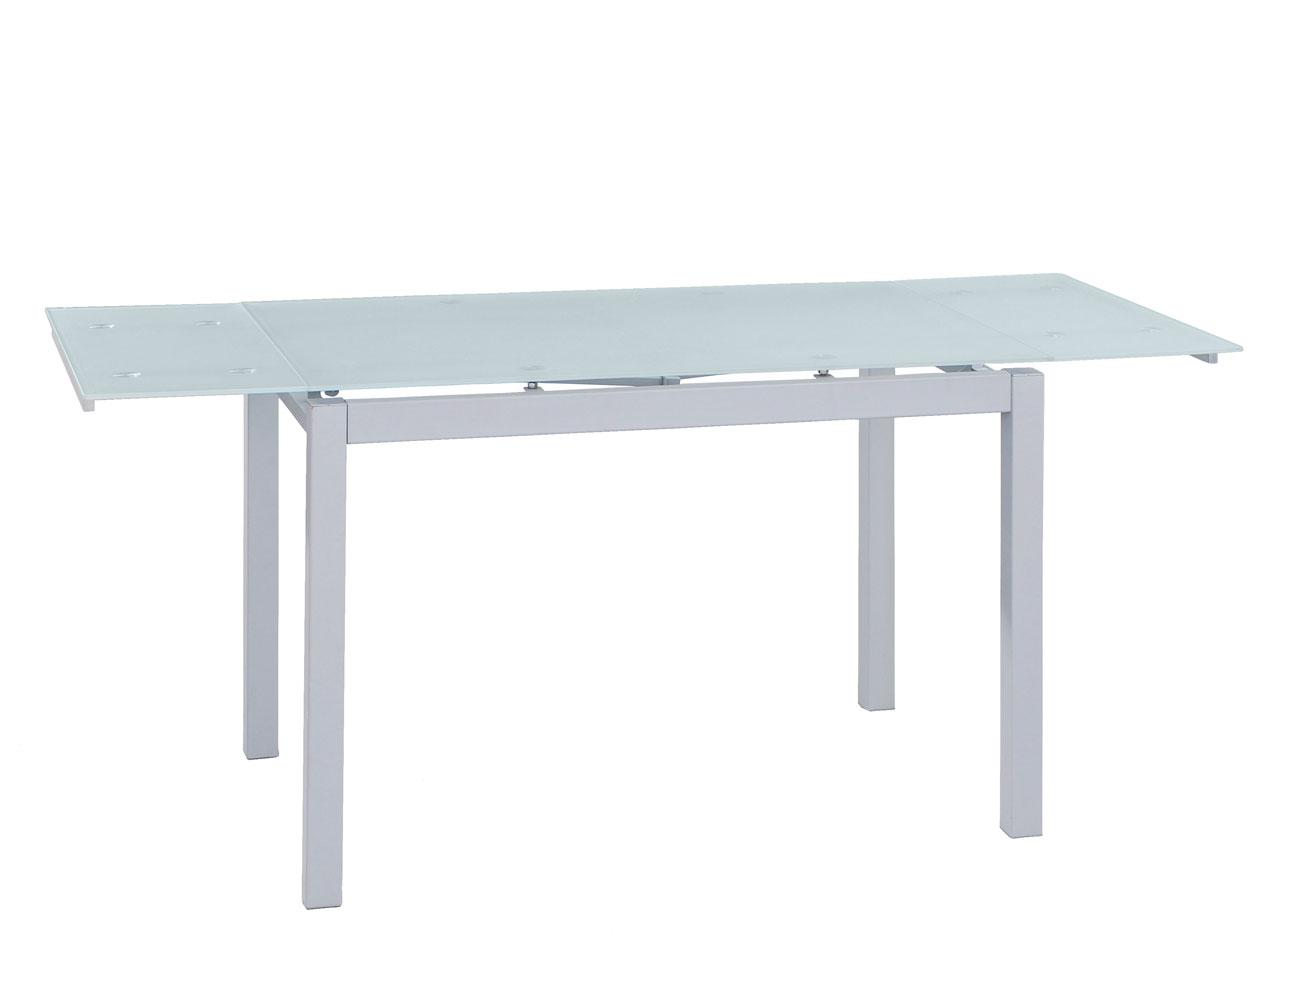 Mesa de cocina extensible en cristal templado 3582 - Mesa cristal blanco ...